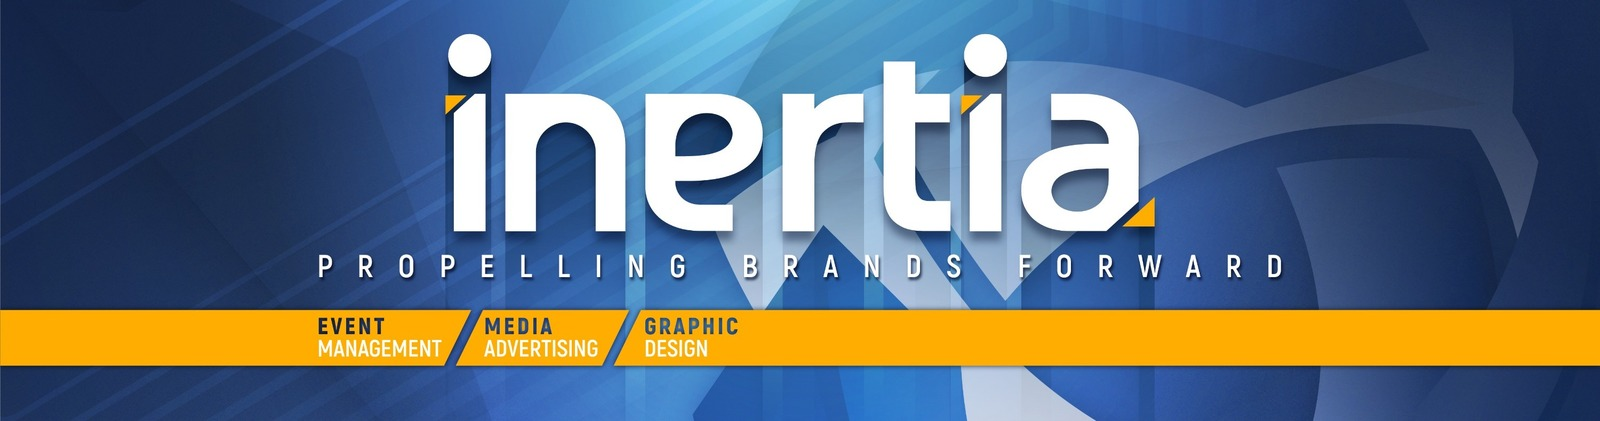 Inertia Marketing